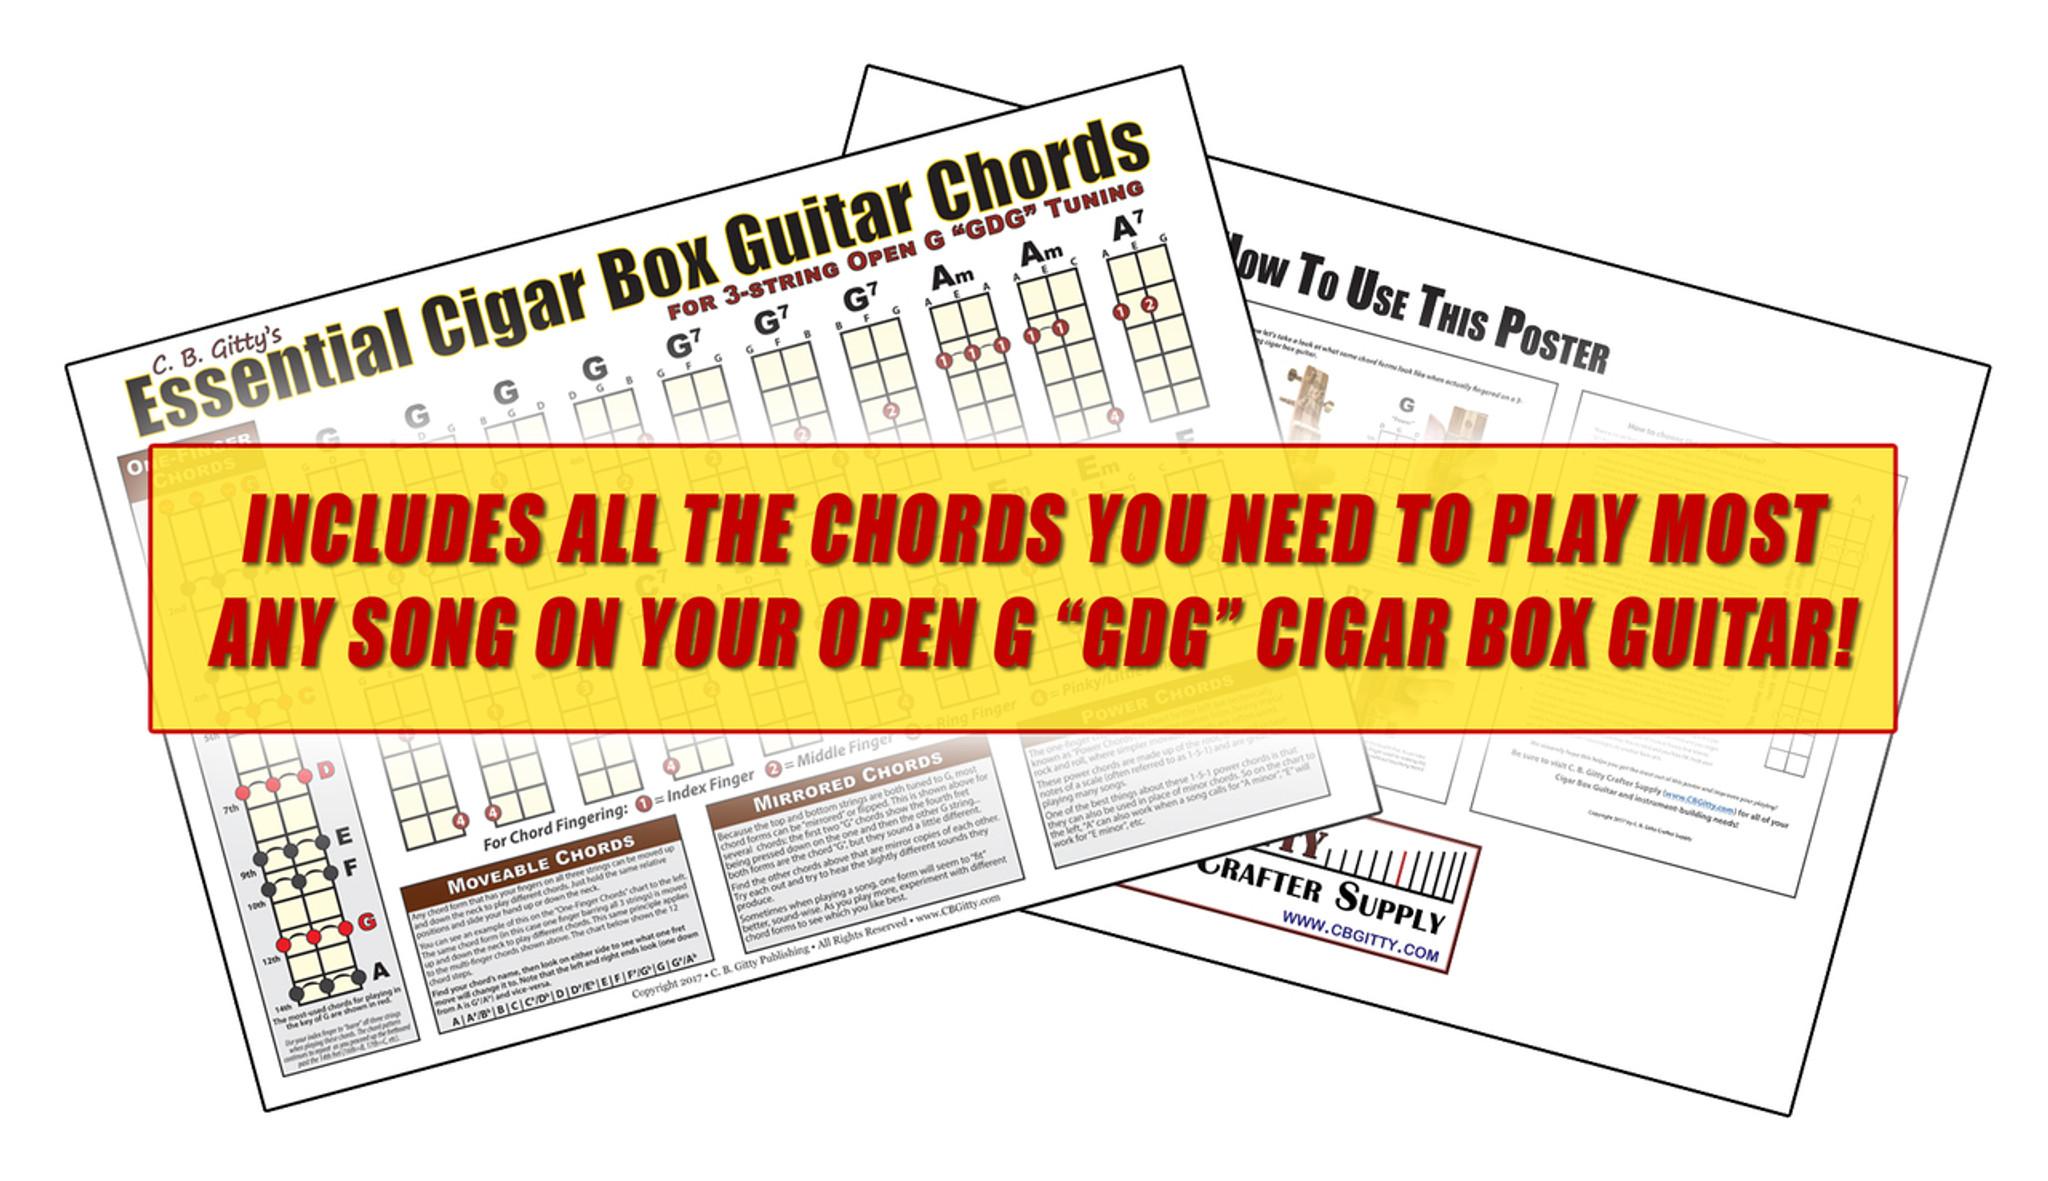 Open G Gdg Essential Cigar Box Guitar Chords Poster C B Gitty